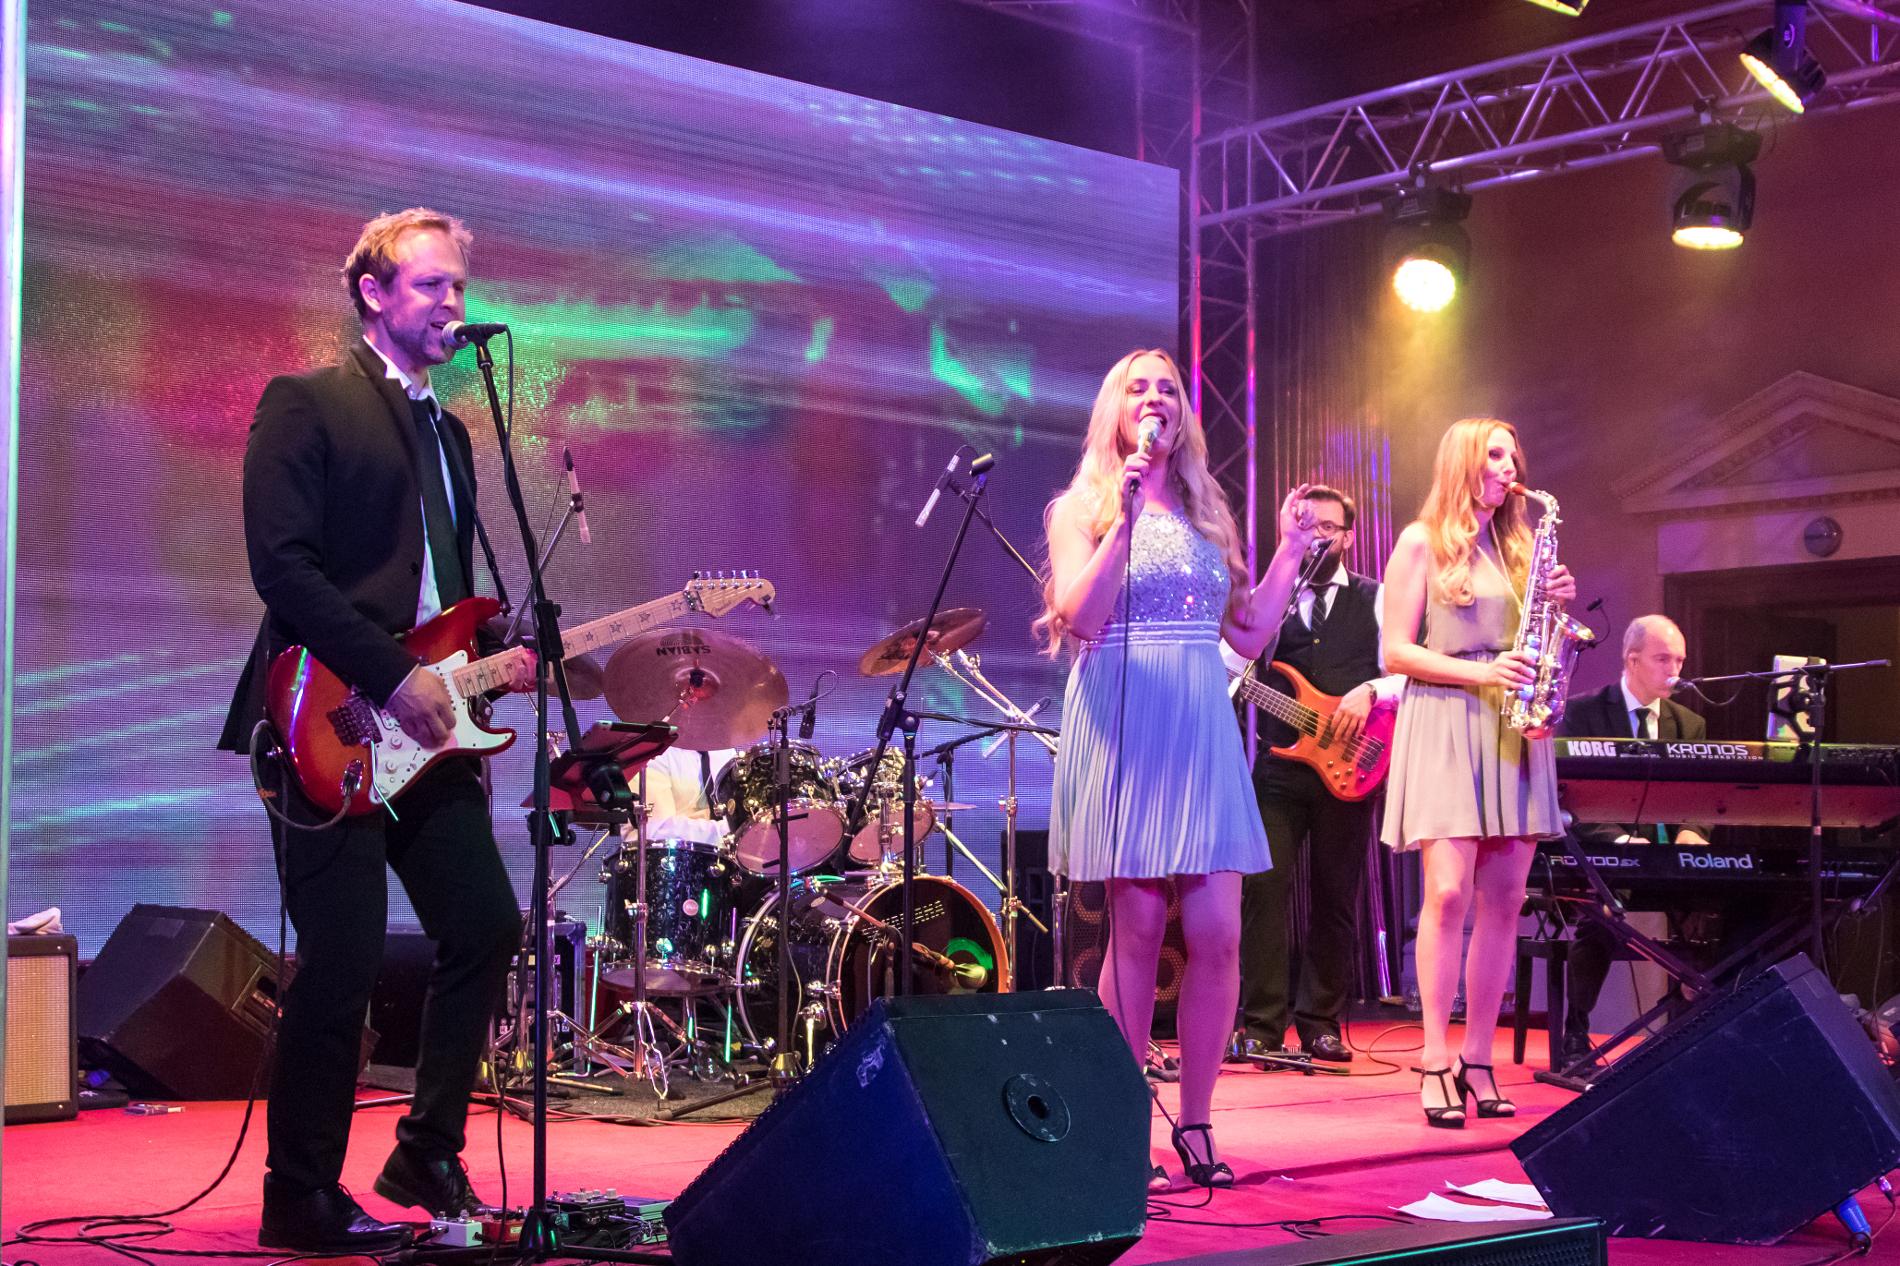 Tanzball, Livemusik, 1st Choice Band aus Köln mit erstklassiger Tanzmusik